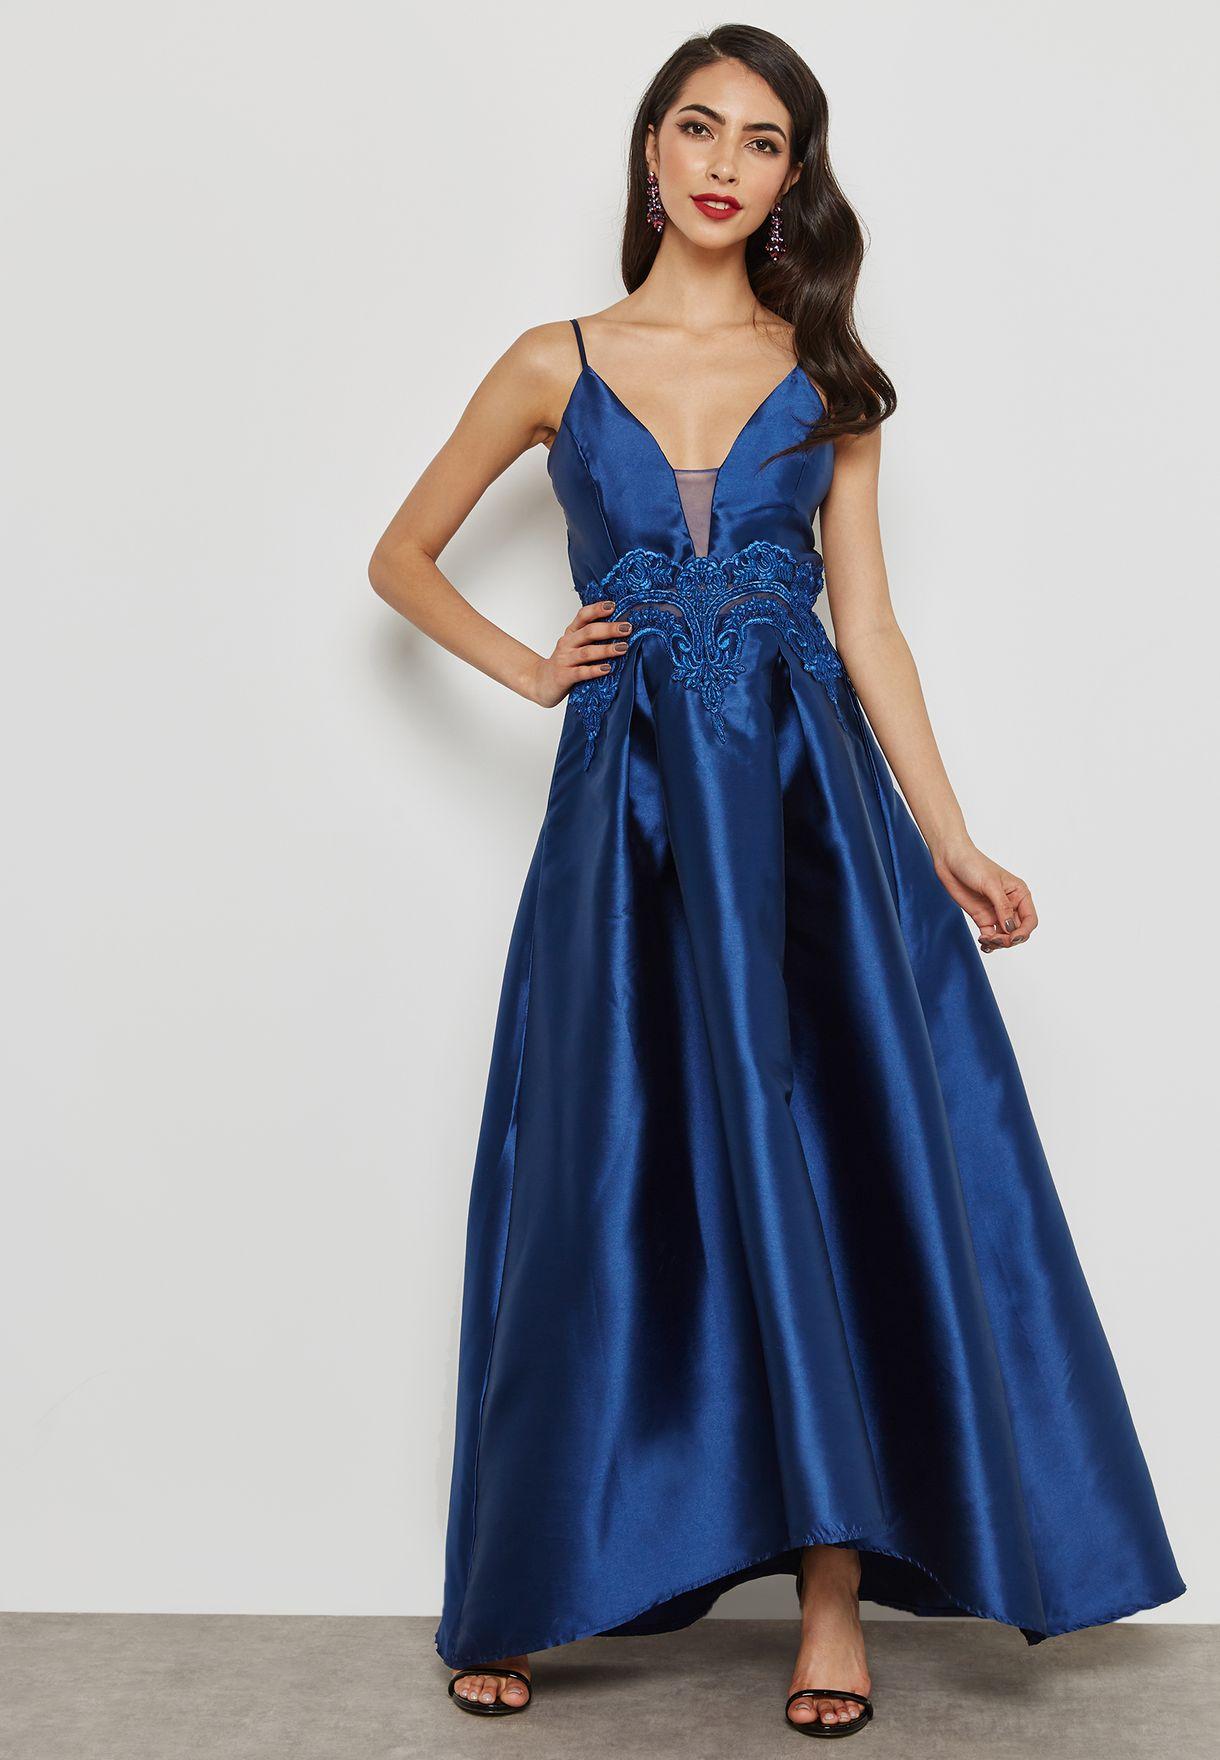 Lace Insert Satin Dress